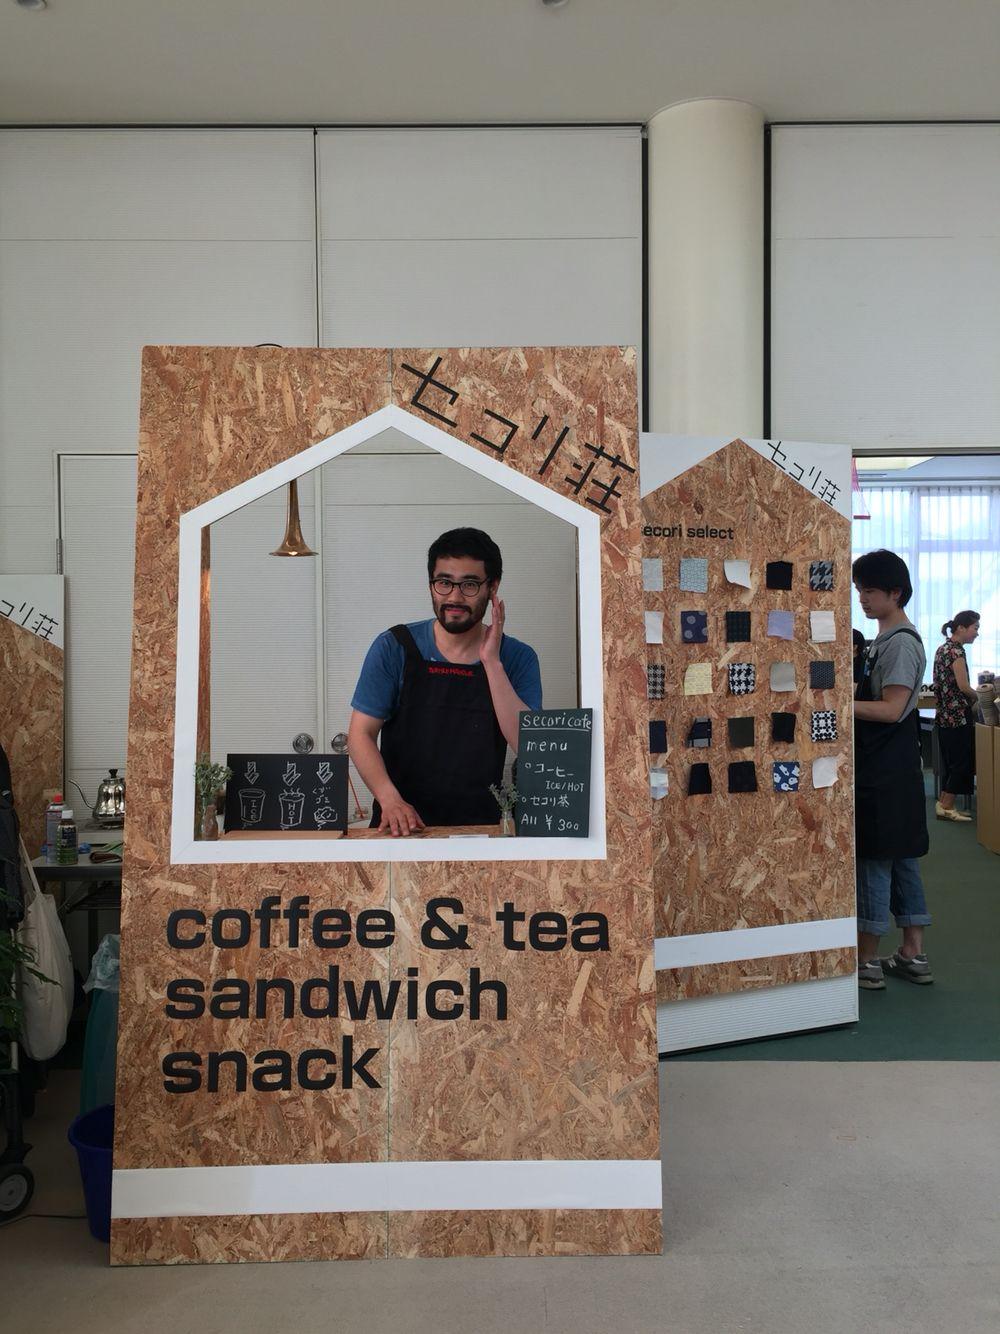 Coffee standkioskpopup shop u pinteresu